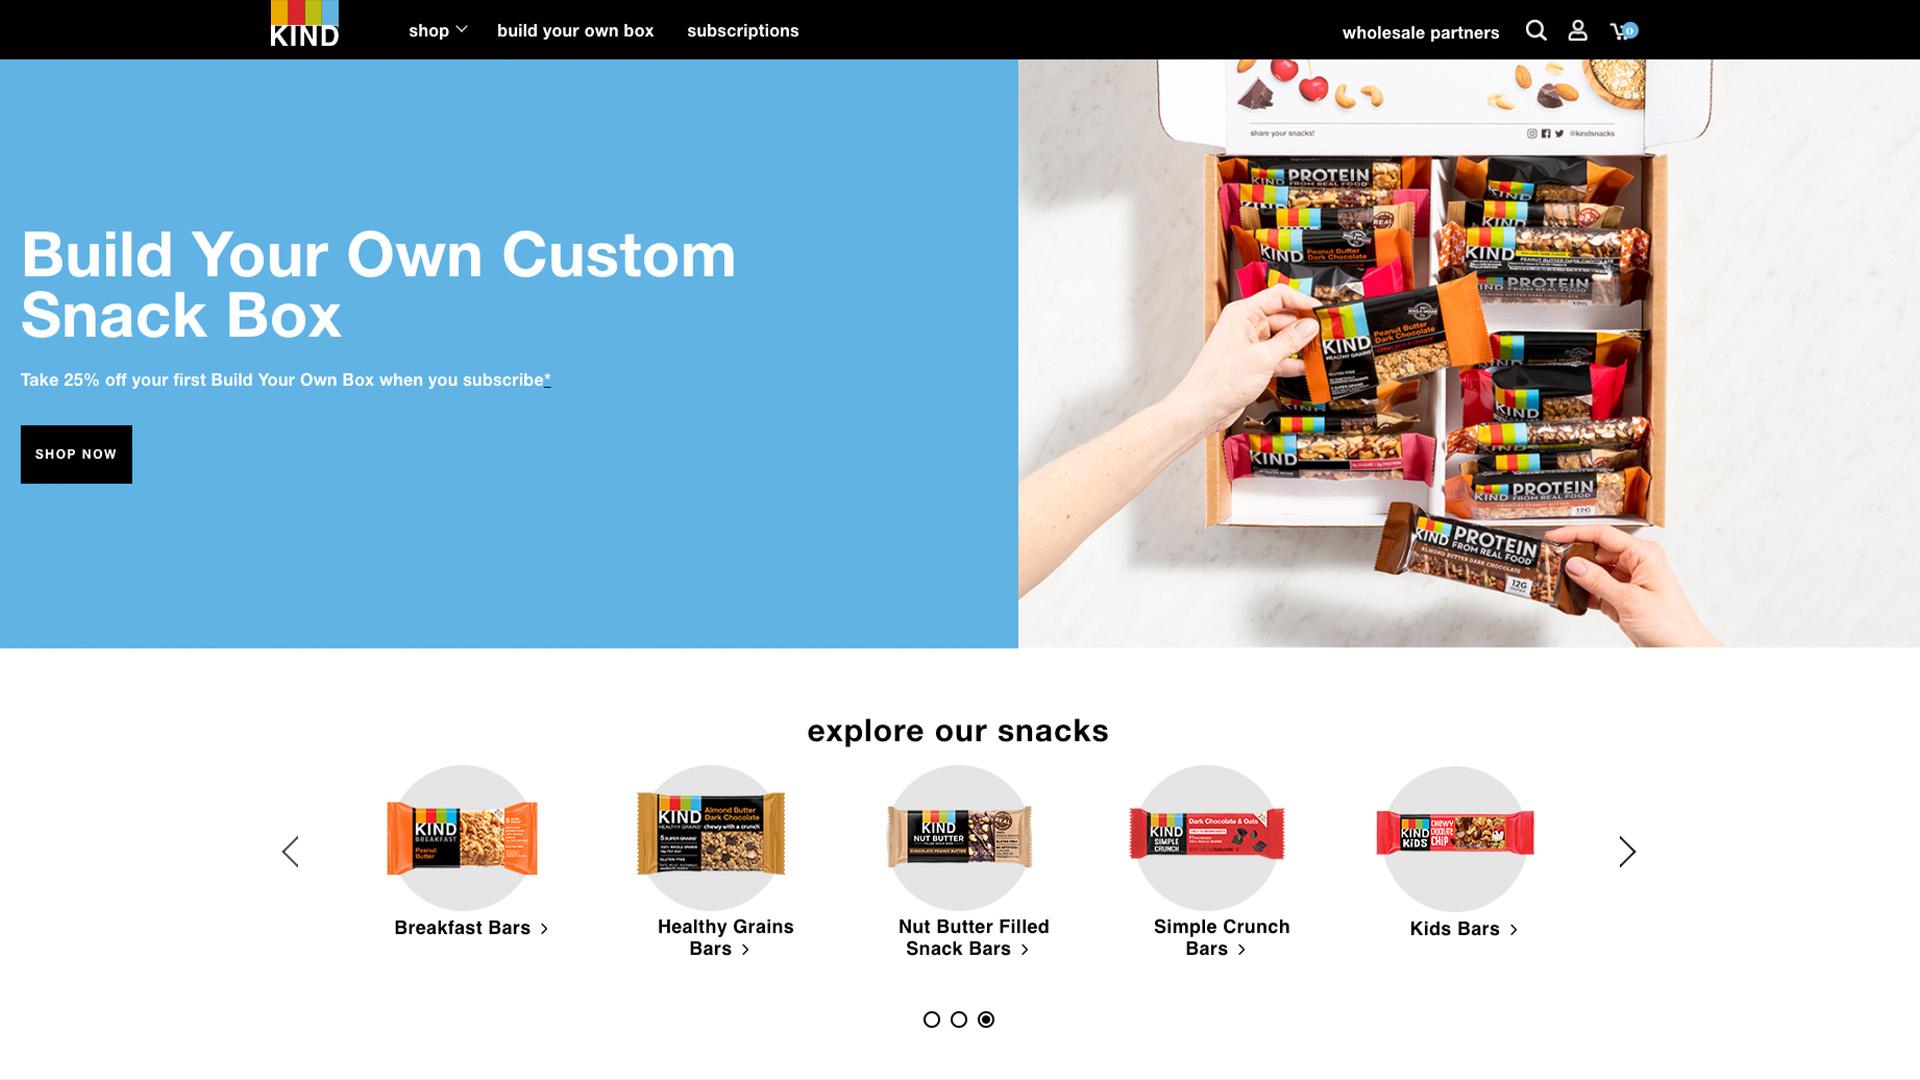 Kind homepage design